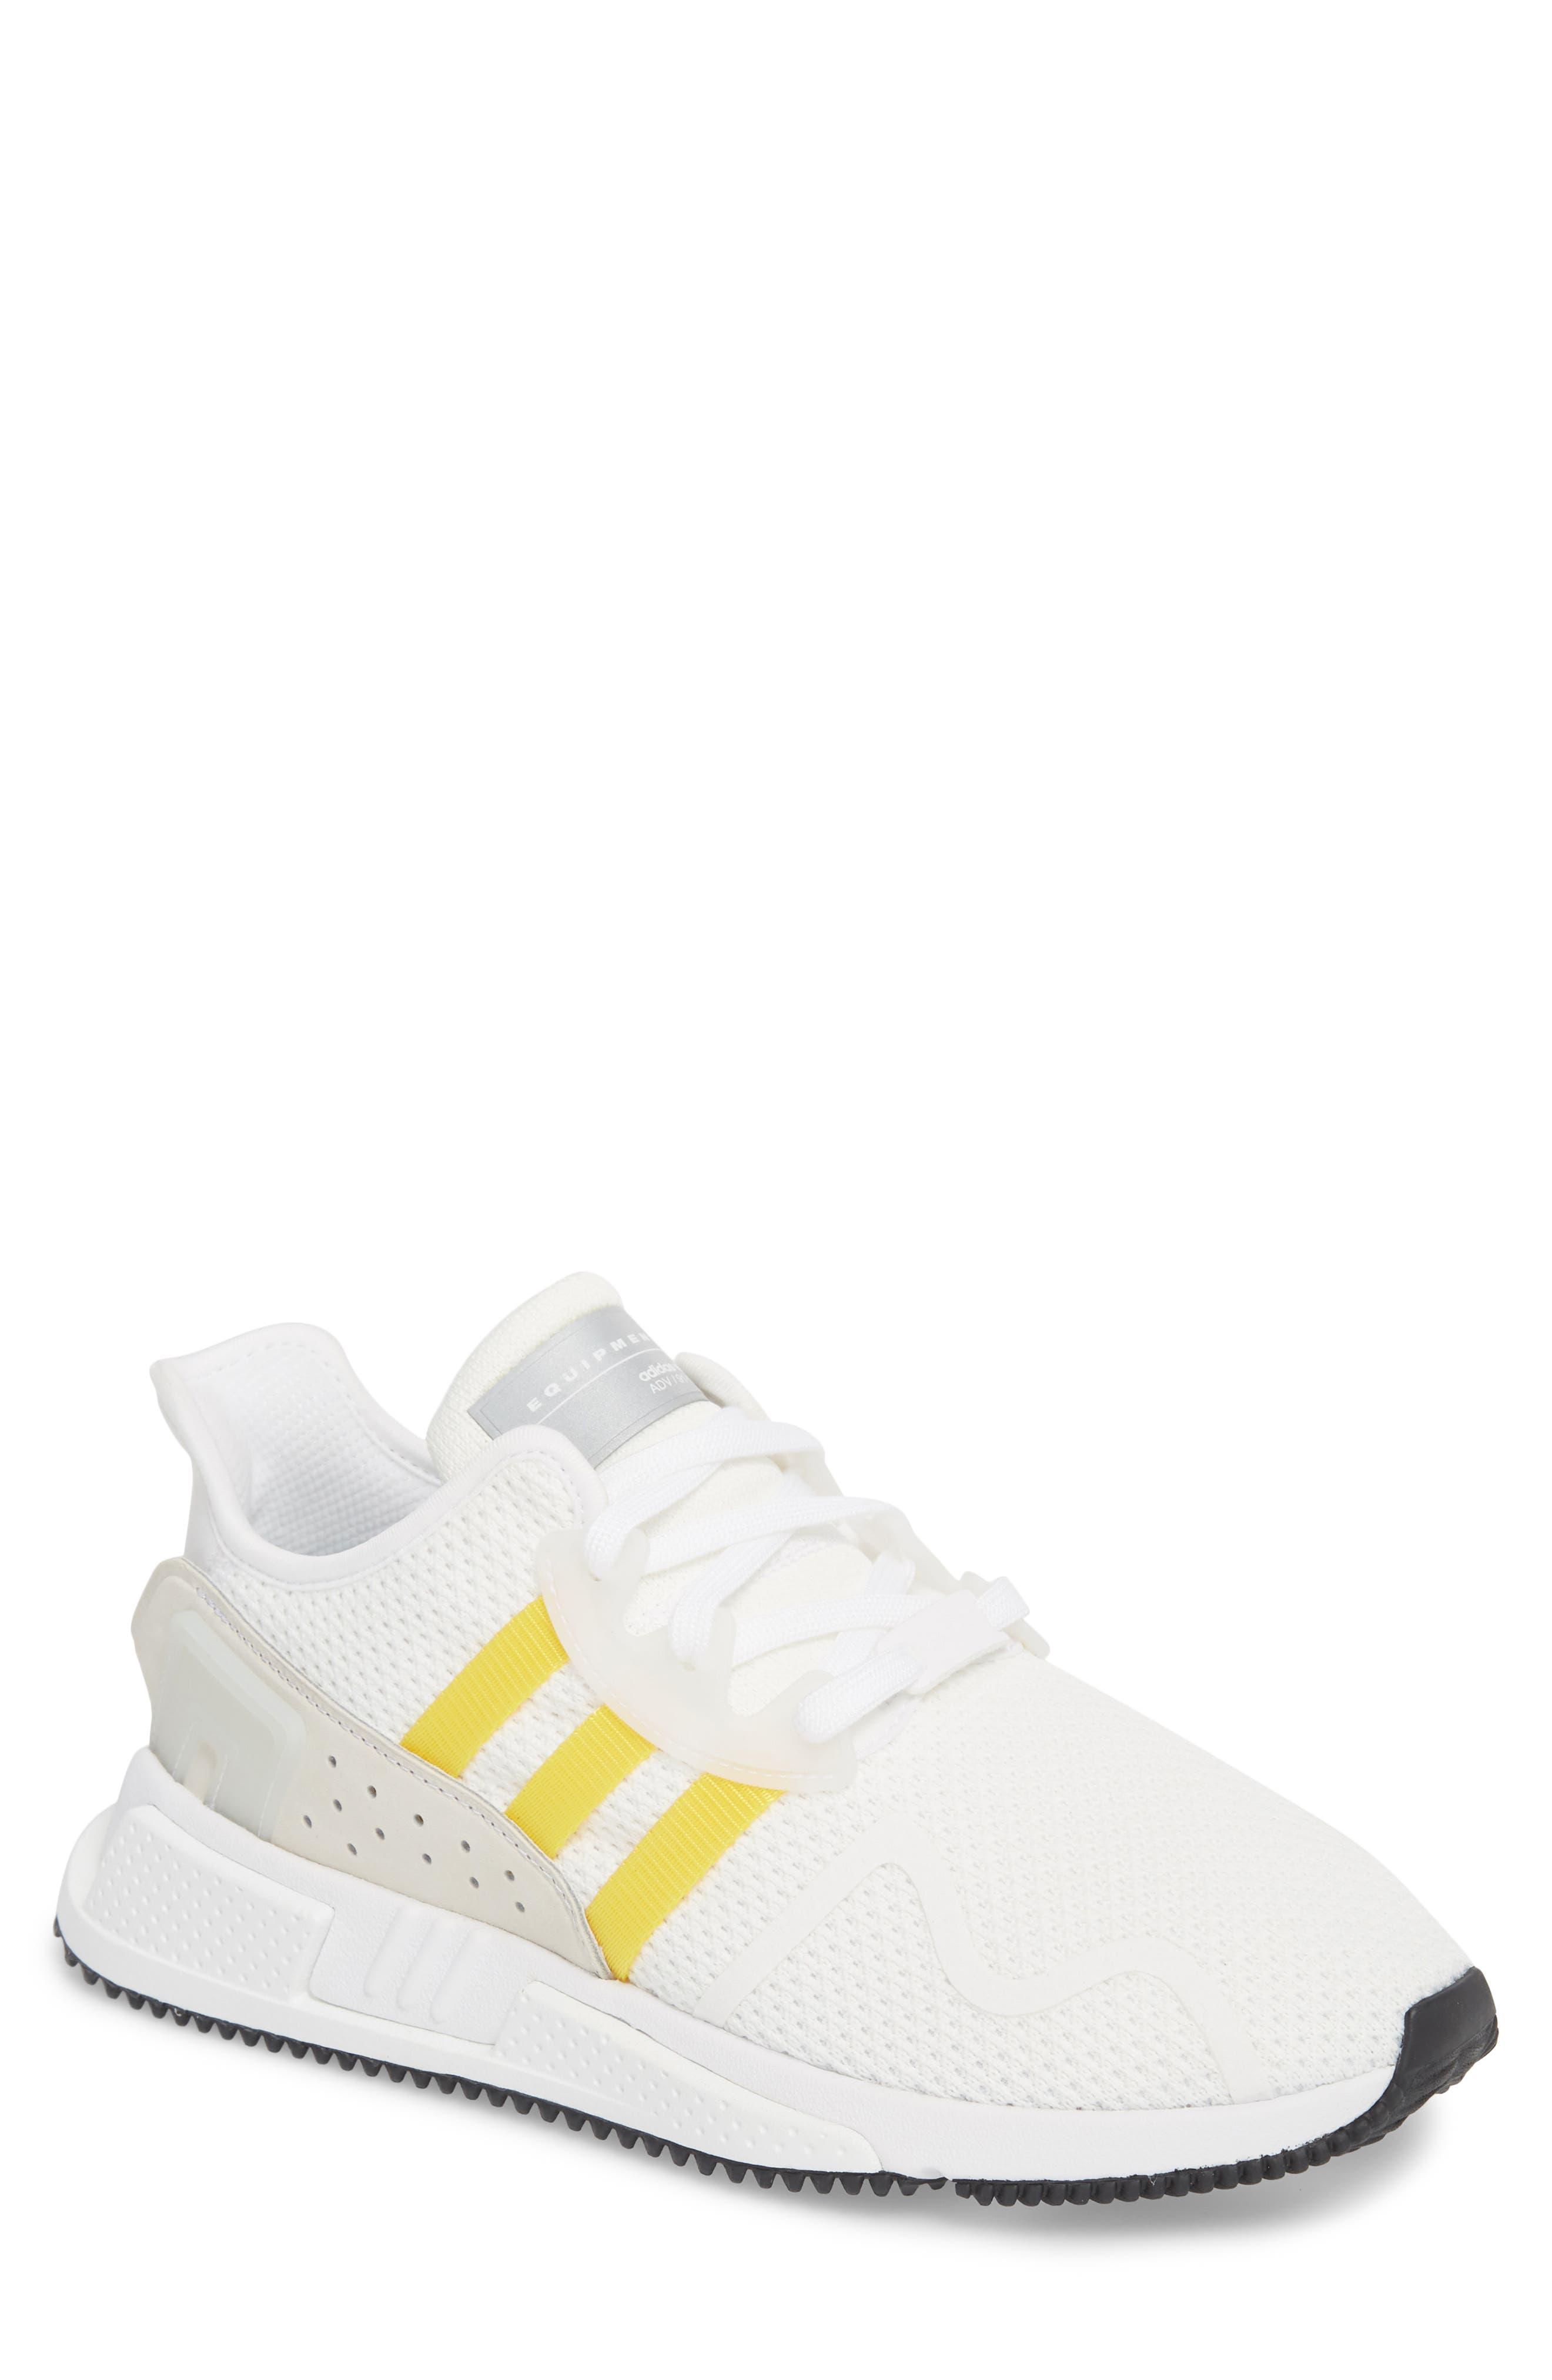 adidas EQT Cushion ADV Sneaker (Men)